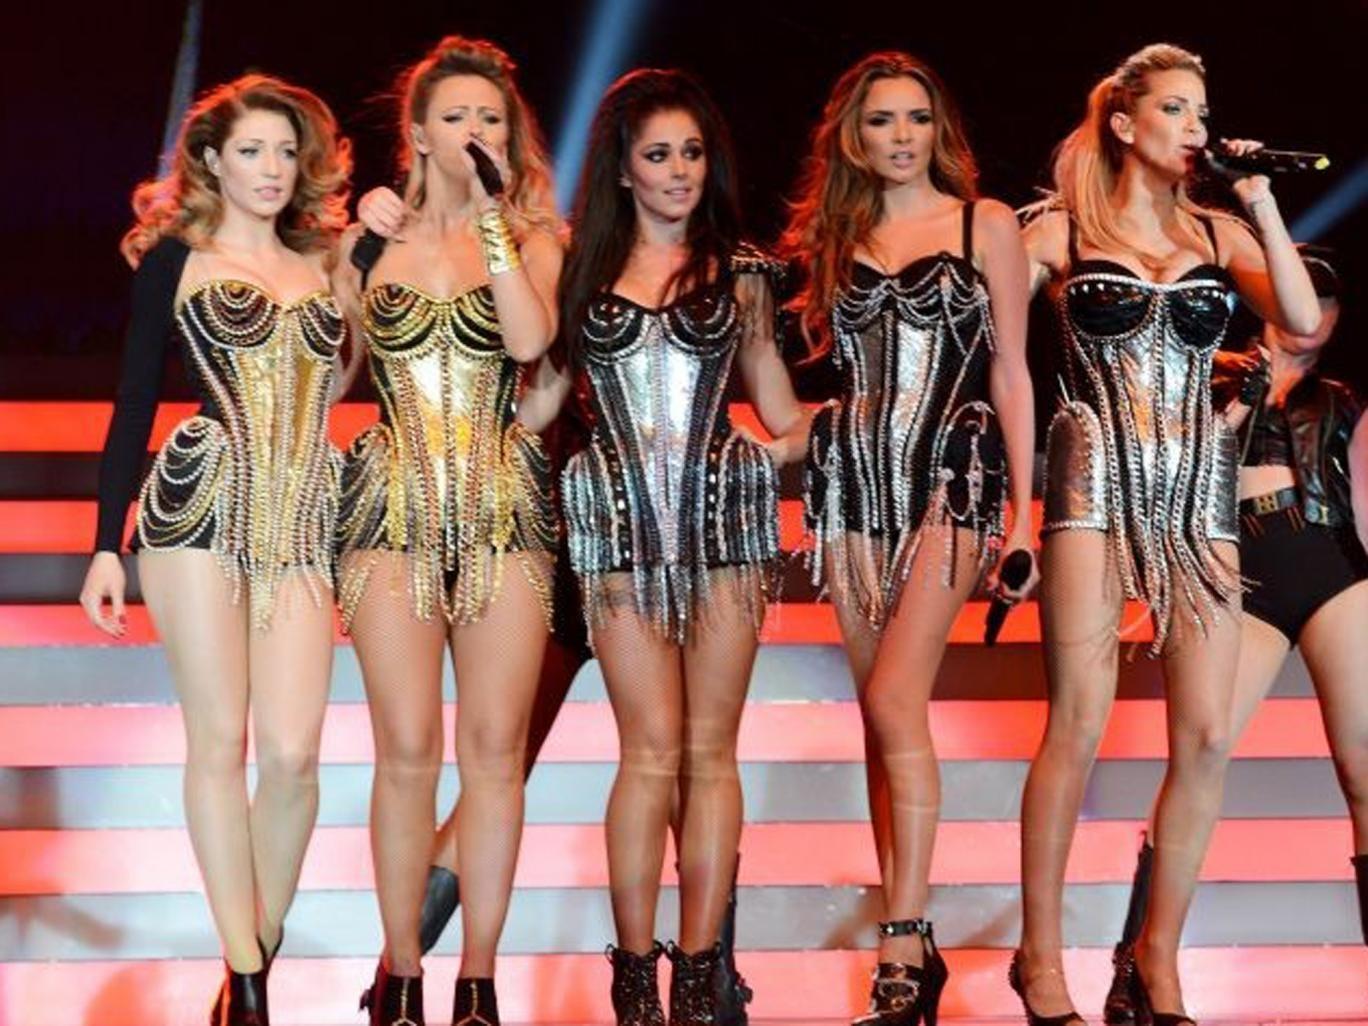 From left: Nicola, Kimberley, Cheryl, Nadine and Sarah